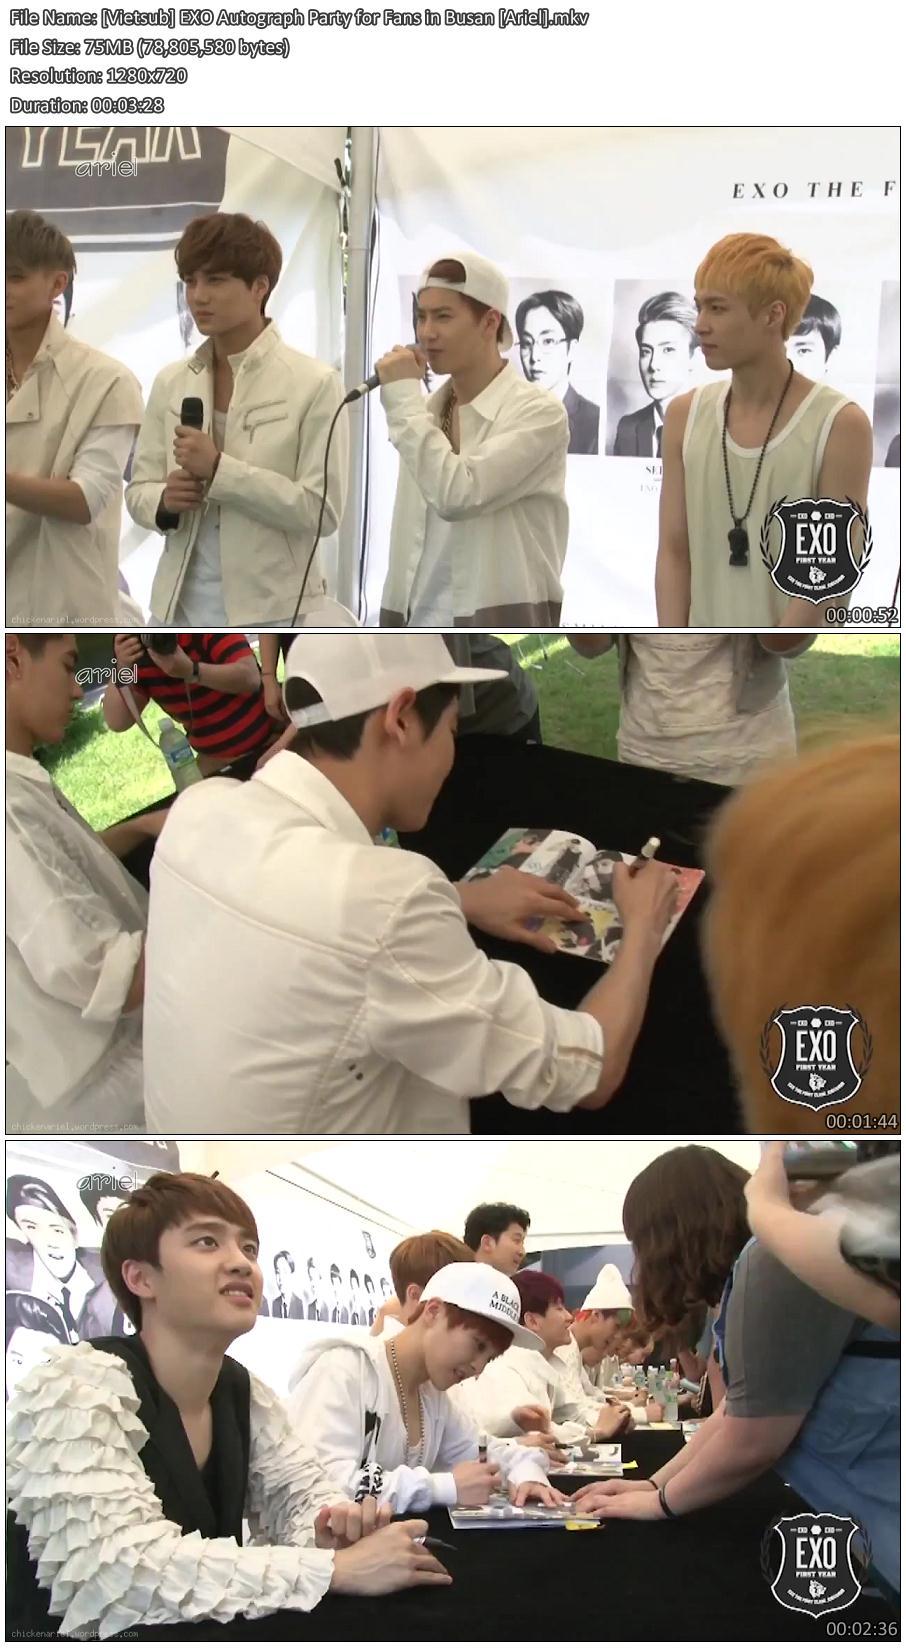 [Vietsub] EXO Autograph Party for Fans in Busan [Ariel]